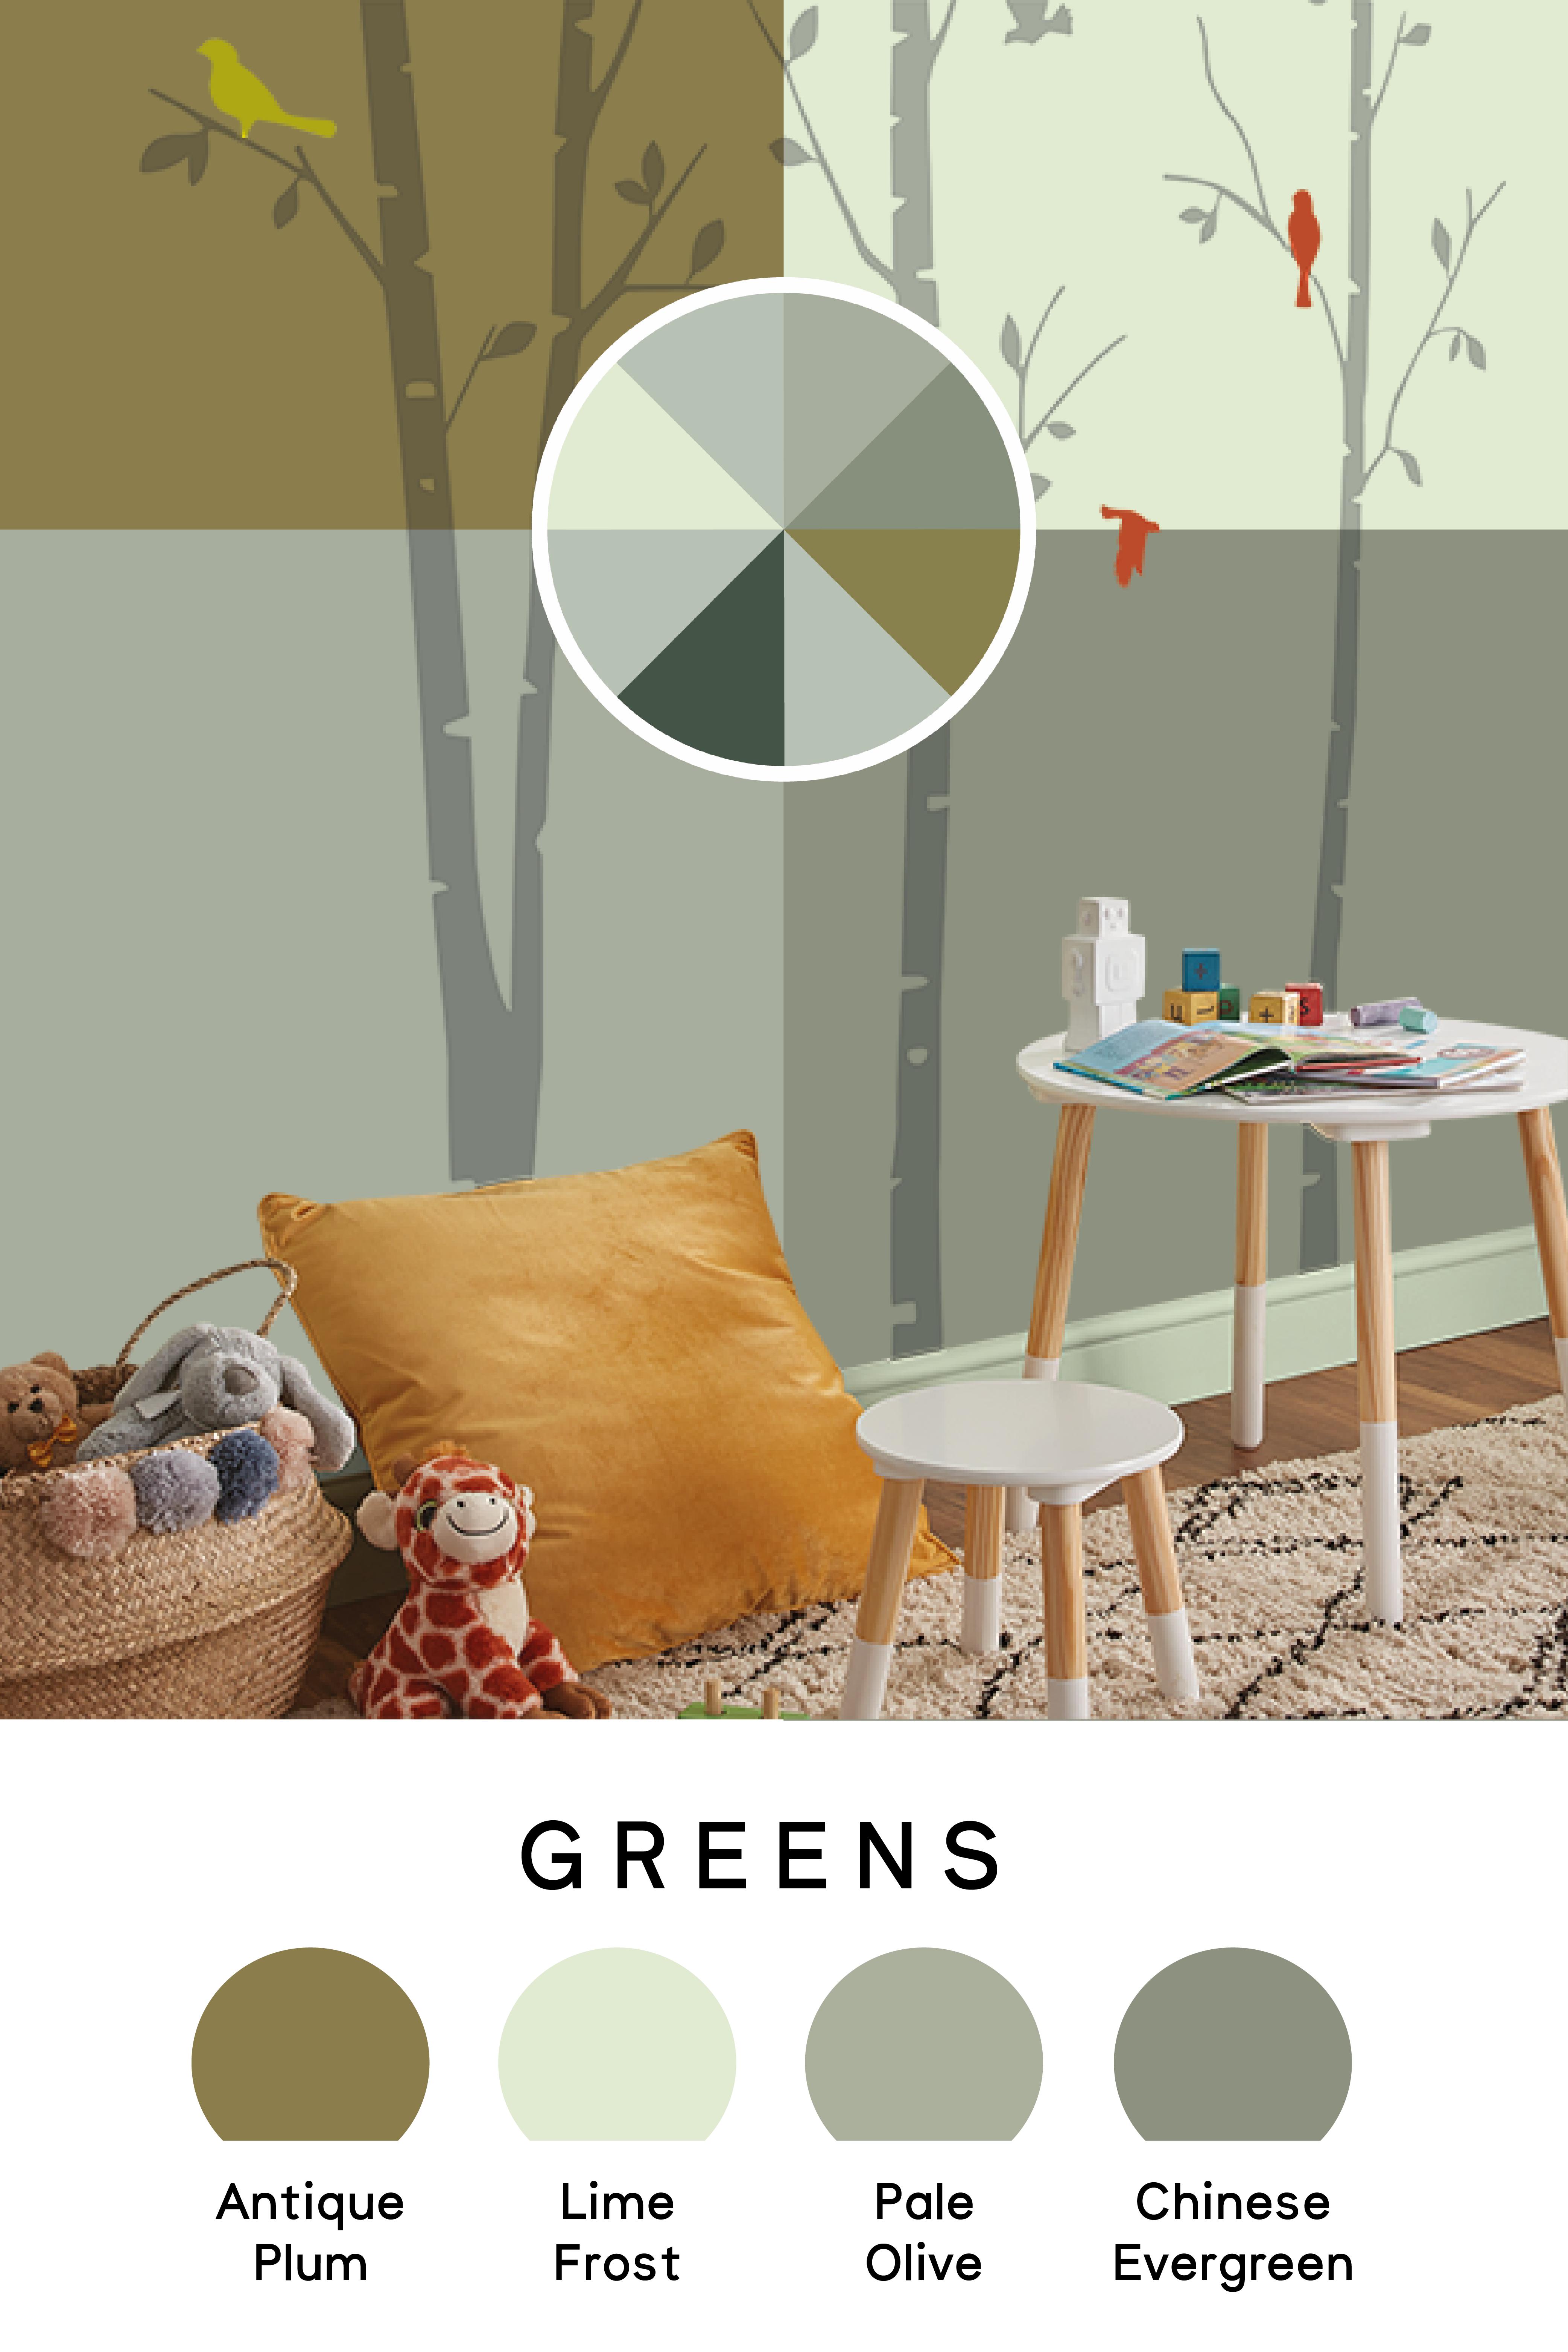 Greens In 2020 Homebase White Painting Soft Furnishings